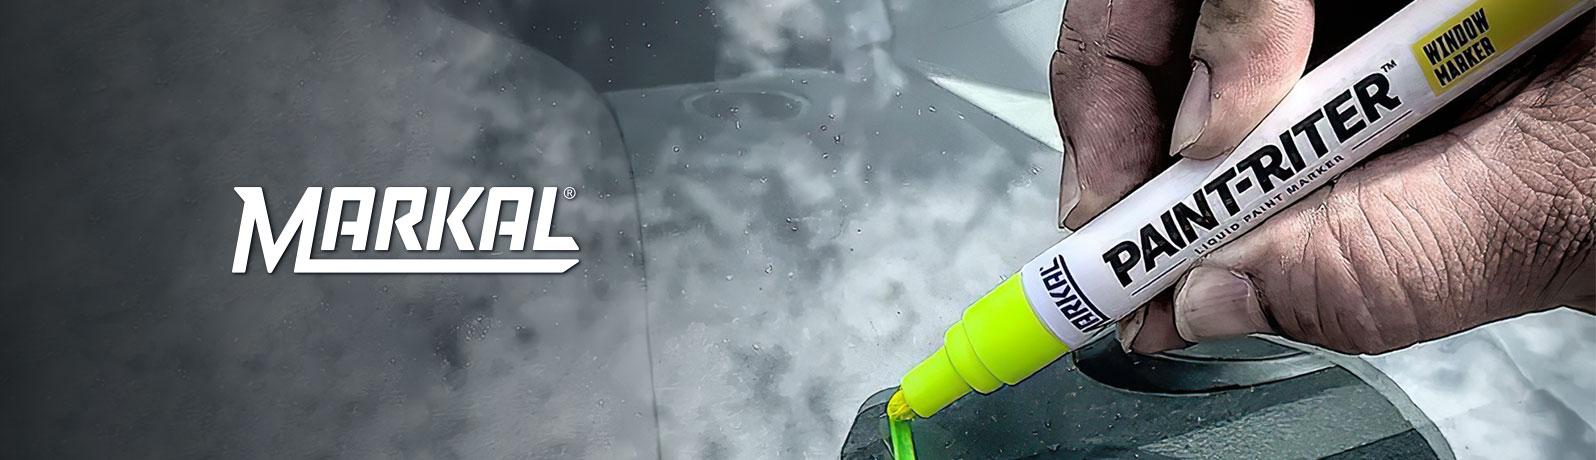 Paint-Riter™ Window Marker